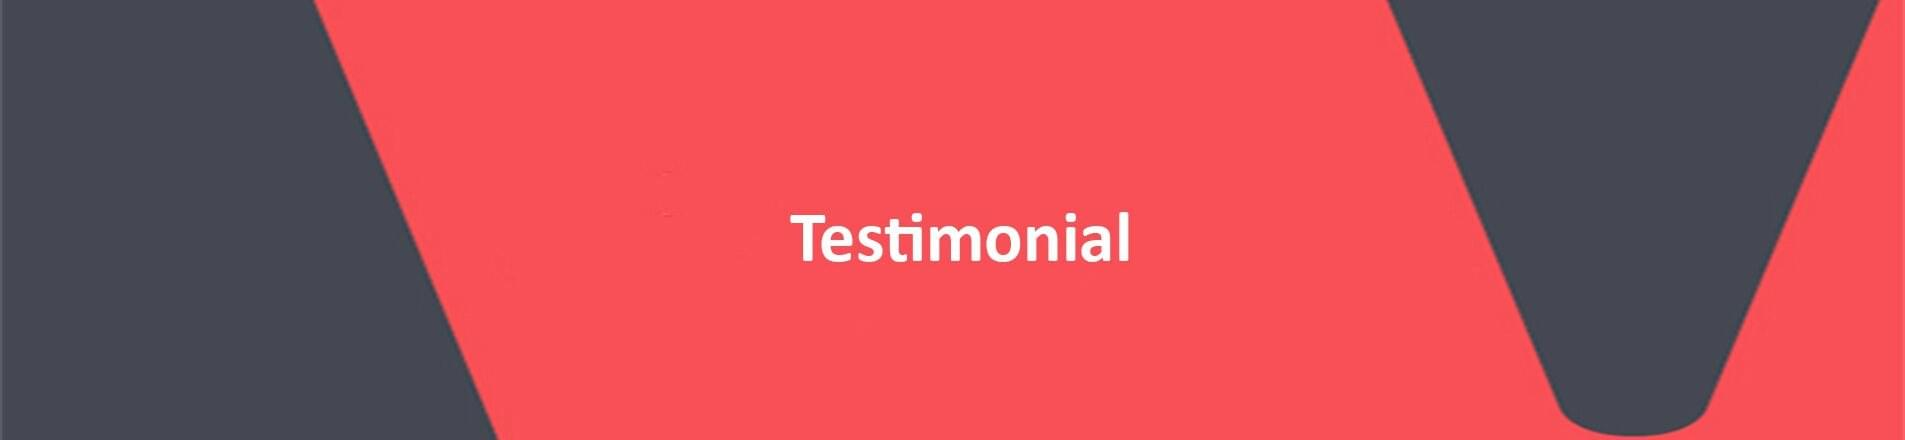 the word 'testimonal' on red VERCIDA background